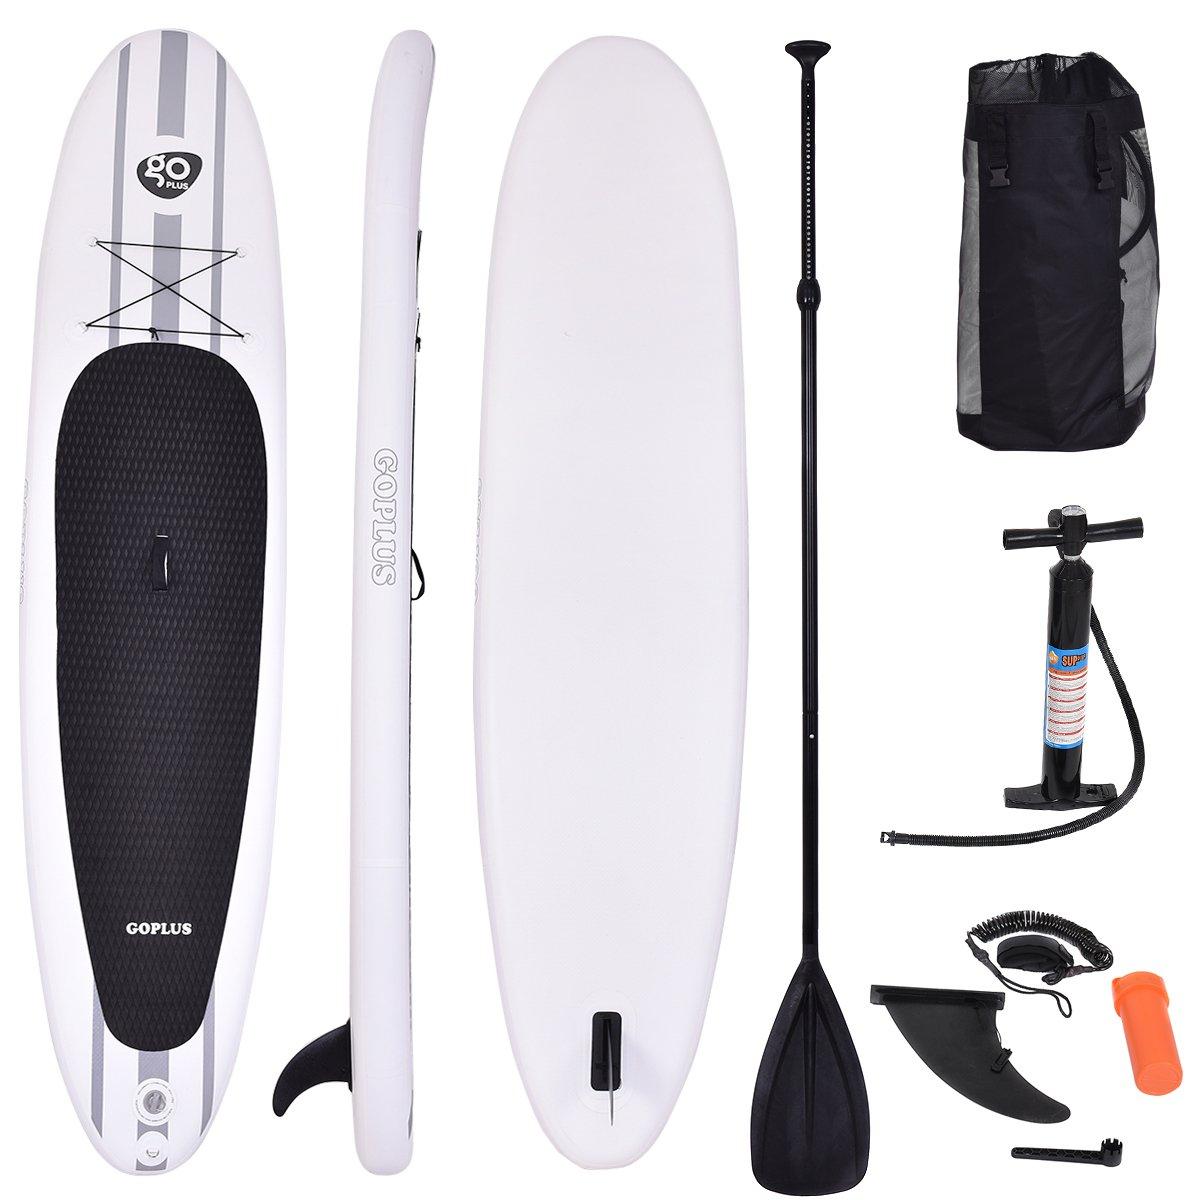 COSTWAY Sup-Board Paddelboard Surfboard Paddelbrett Stand Up Board Set aufblasbar inkl Sicherungsleine